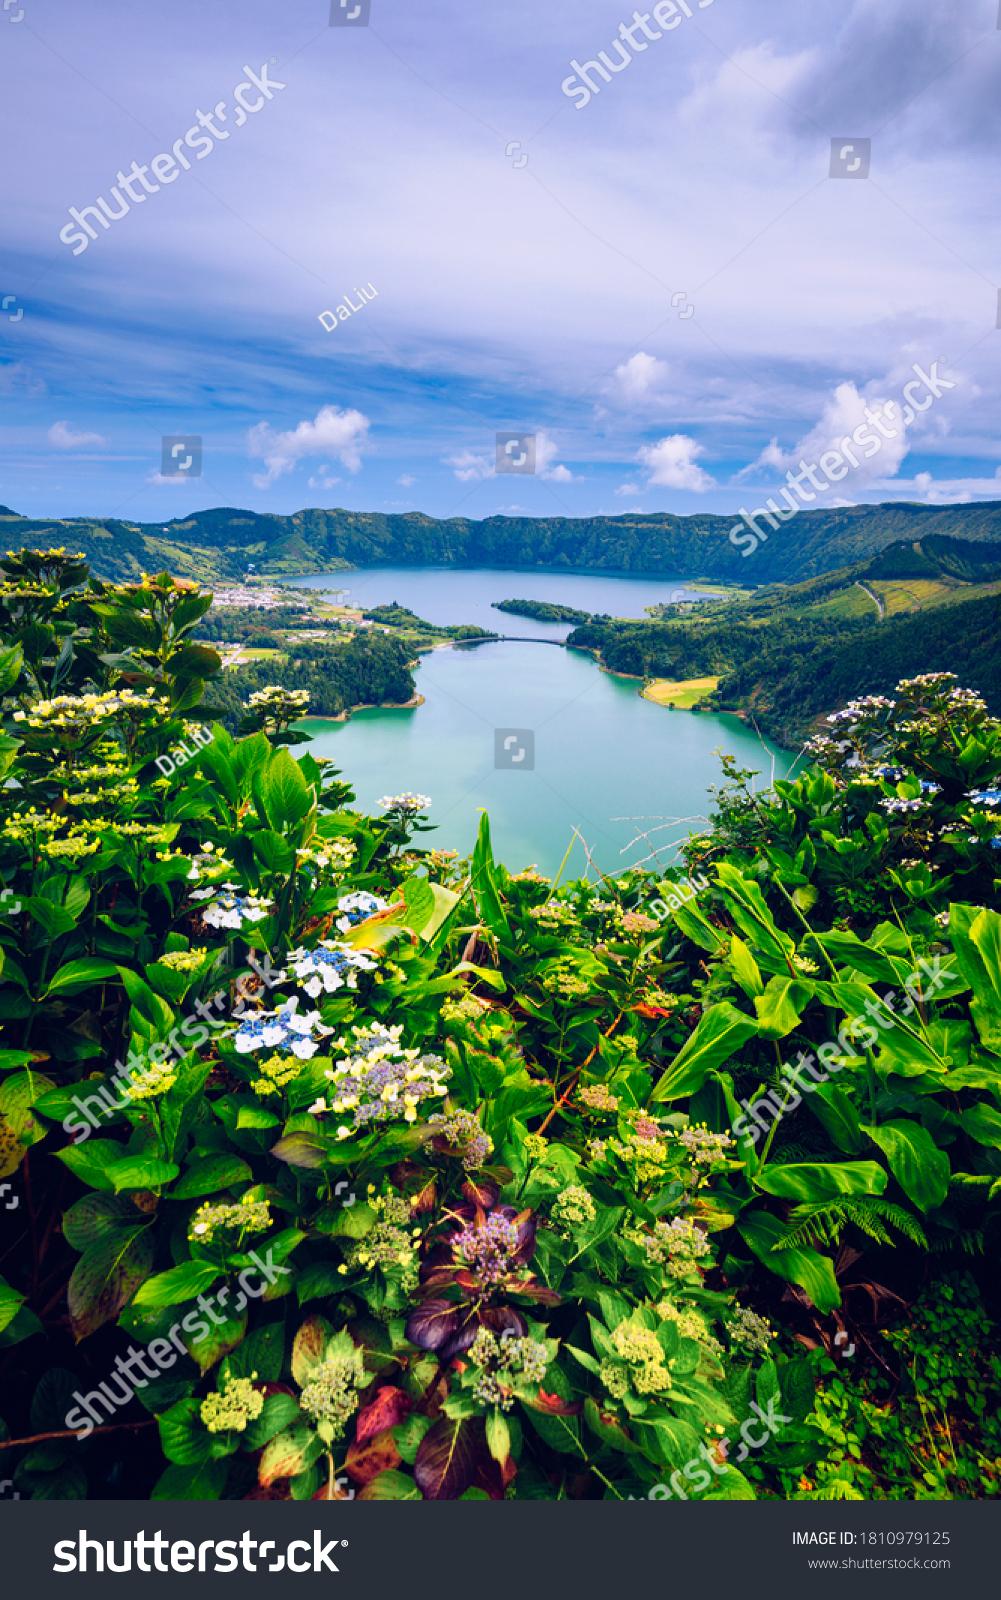 The Astonishing Lagoon Of The Seven Cities (Lagoa Das 7 Cidades), In Sao Miguel Azores, Portugal. Lagoon of the Seven Cities, Sao Miguel island, Azores. Ocean, aerial. Sao Miguel, Azores, Portugal. #1810979125